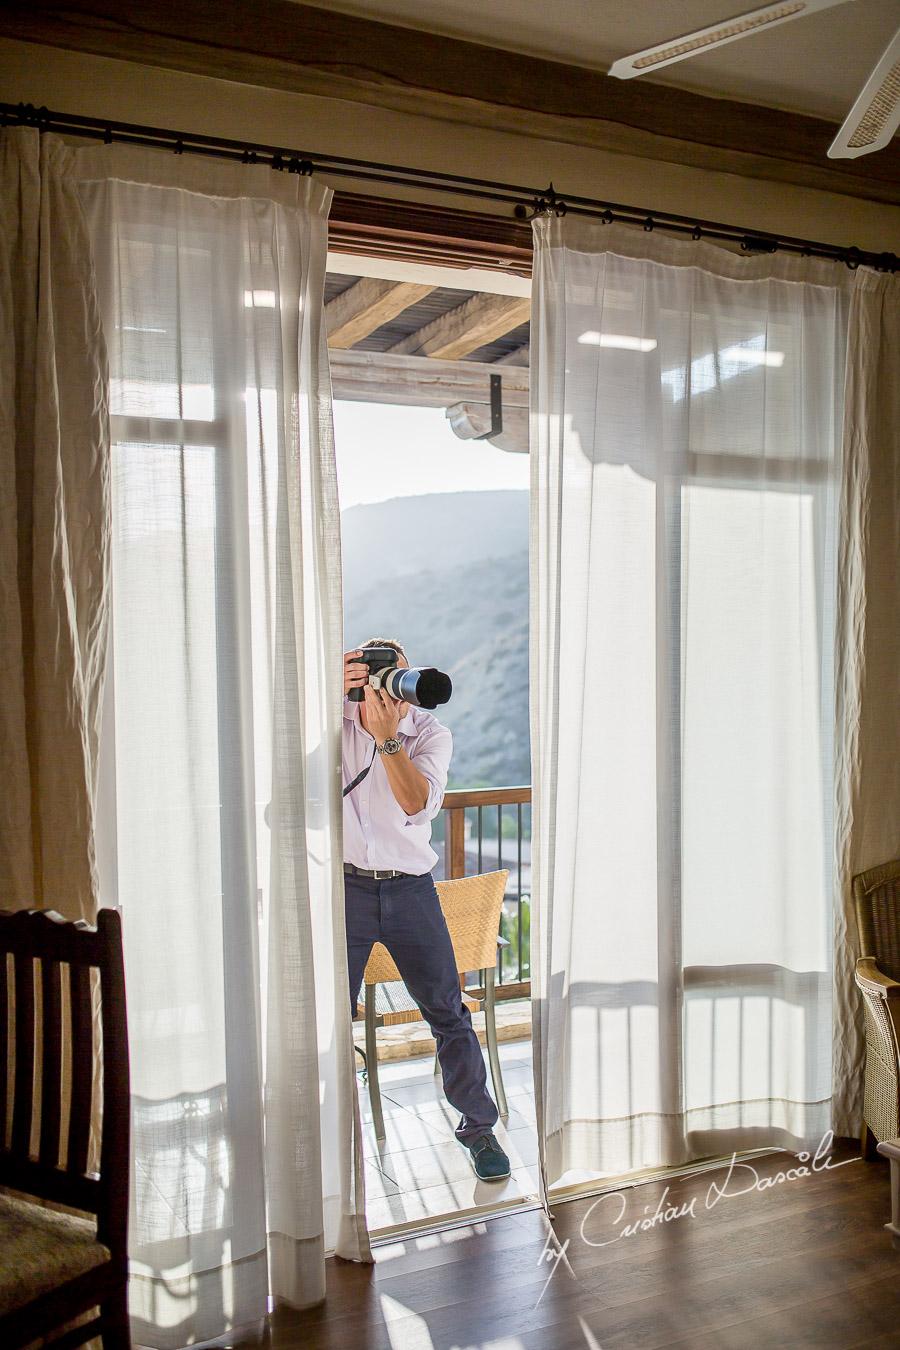 Cyprus-Professional-Photographer-02